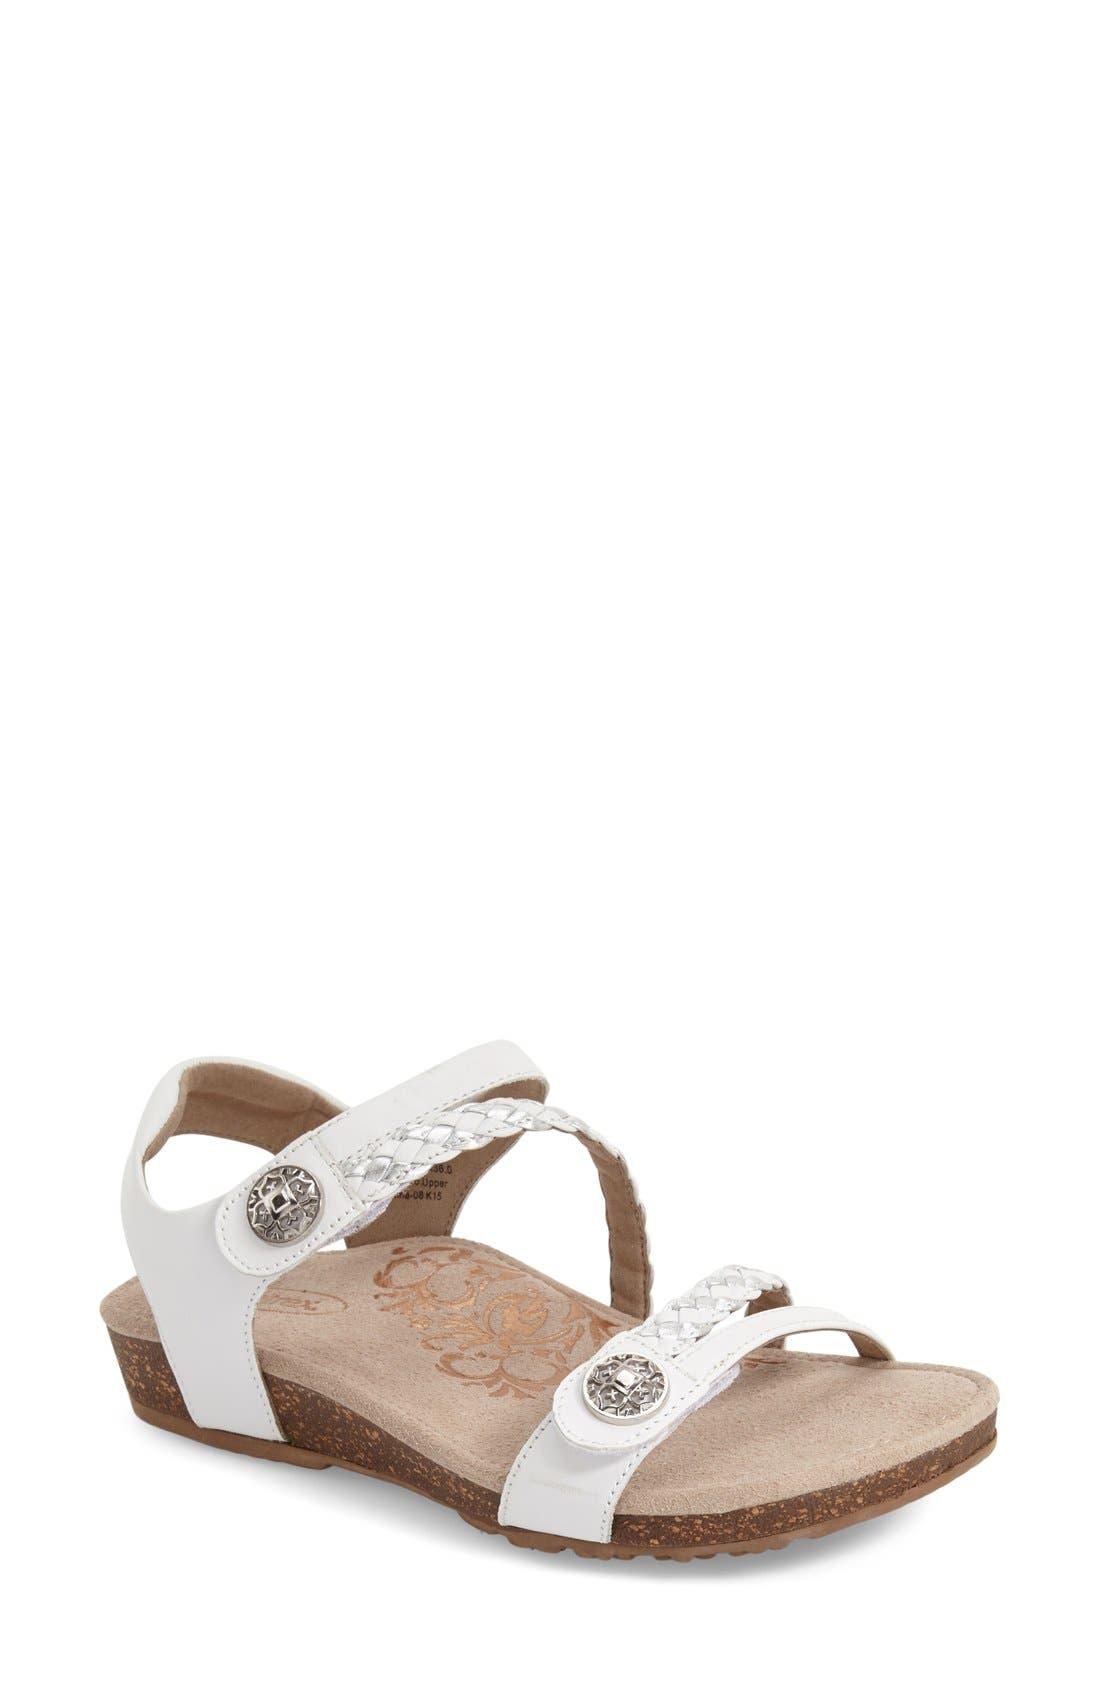 Aetrex 'Jillian' Braided Leather Strap Sandal (Women)